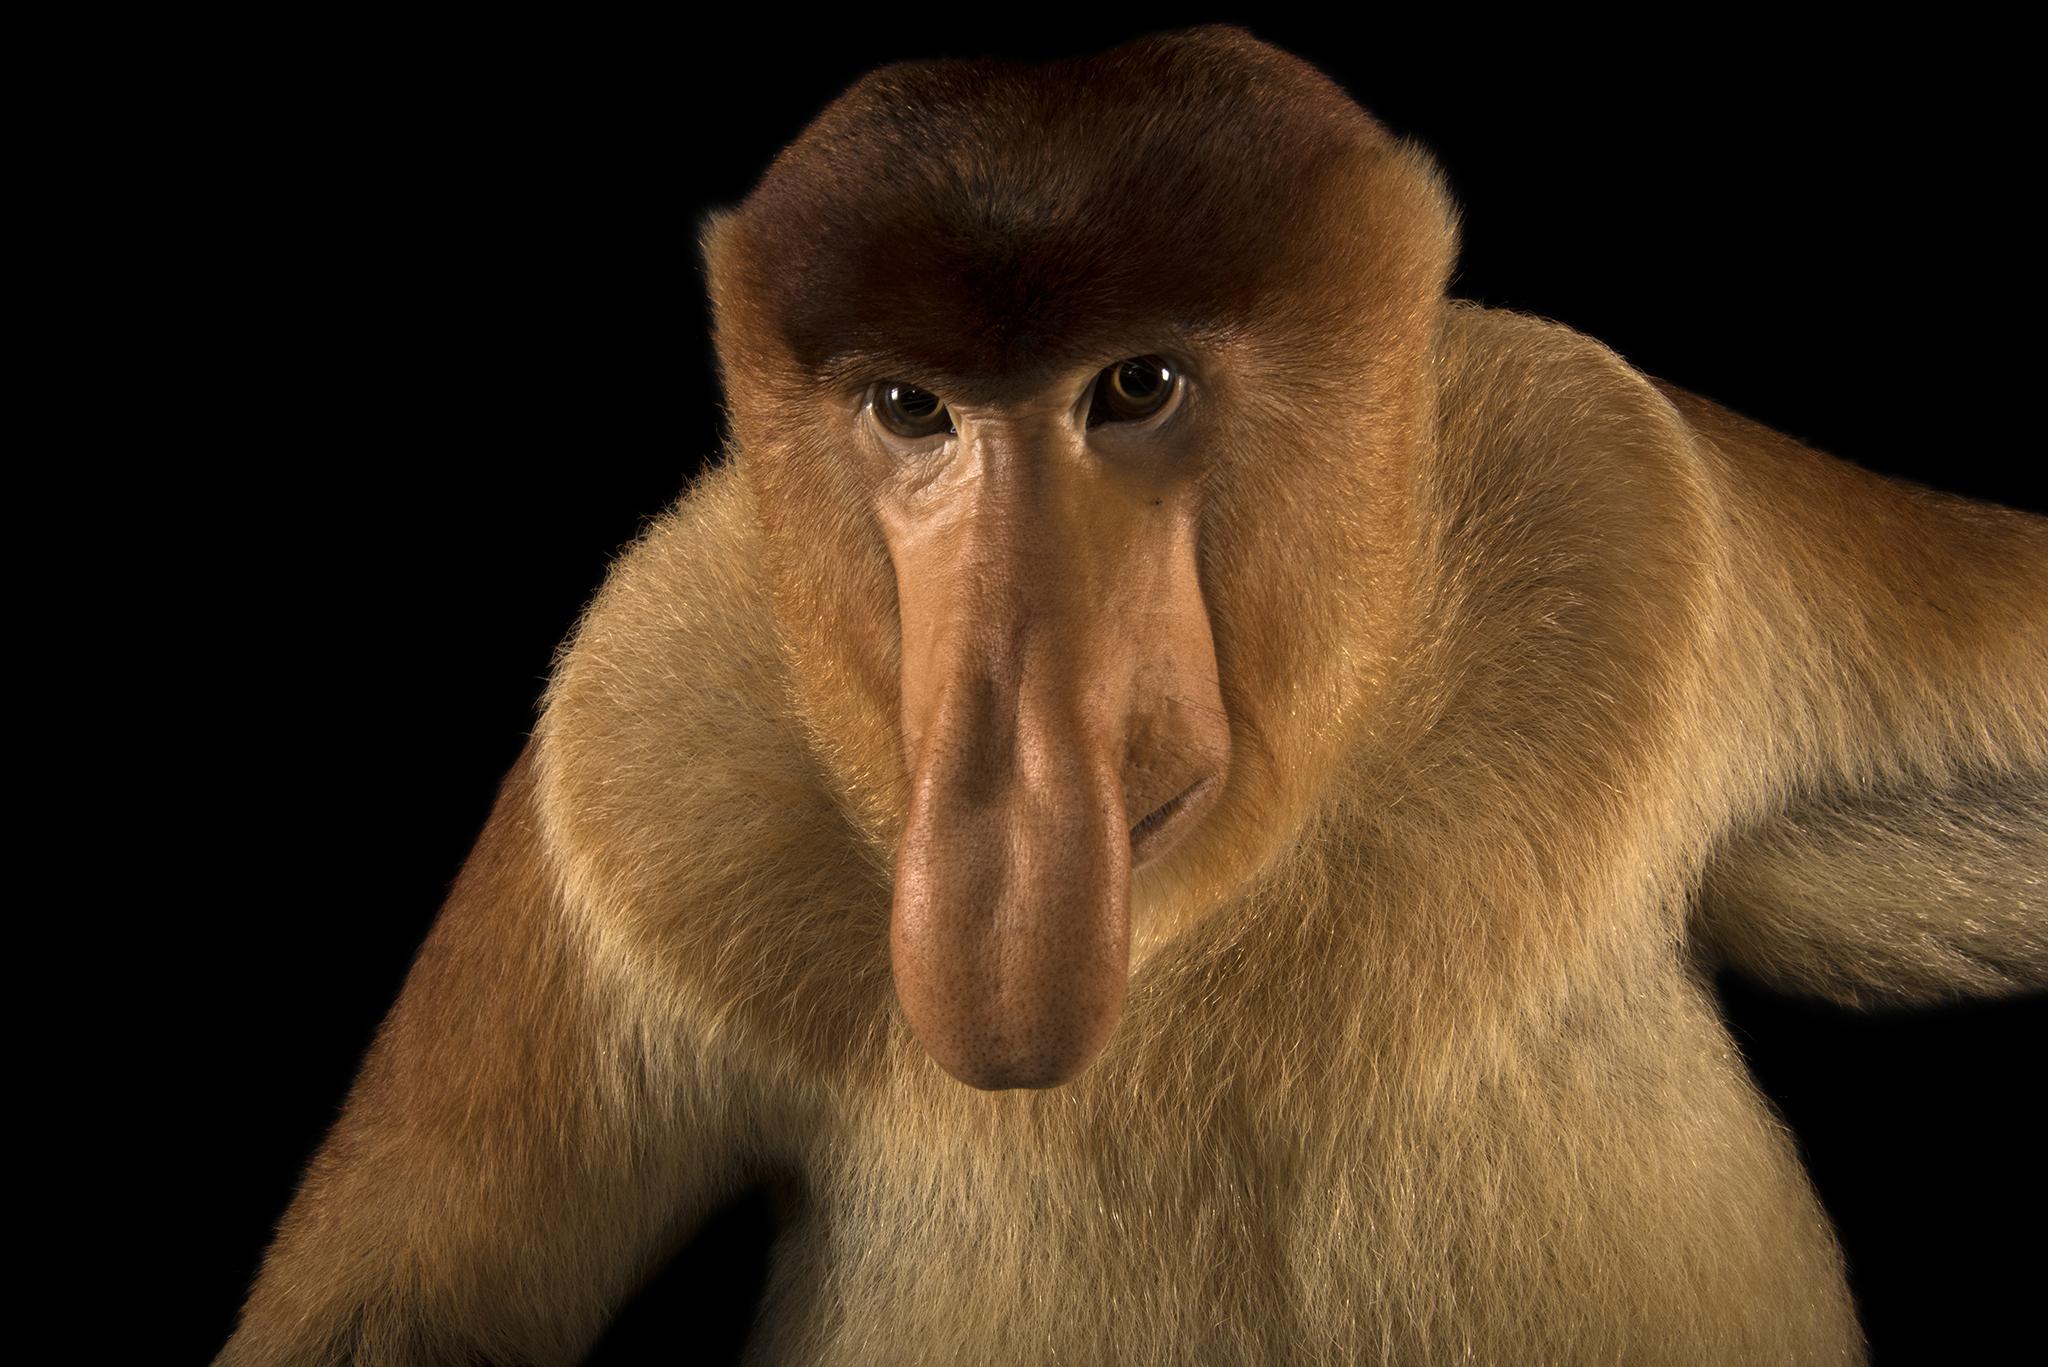 HQ Proboscis Monkey Wallpapers | File 1660.01Kb